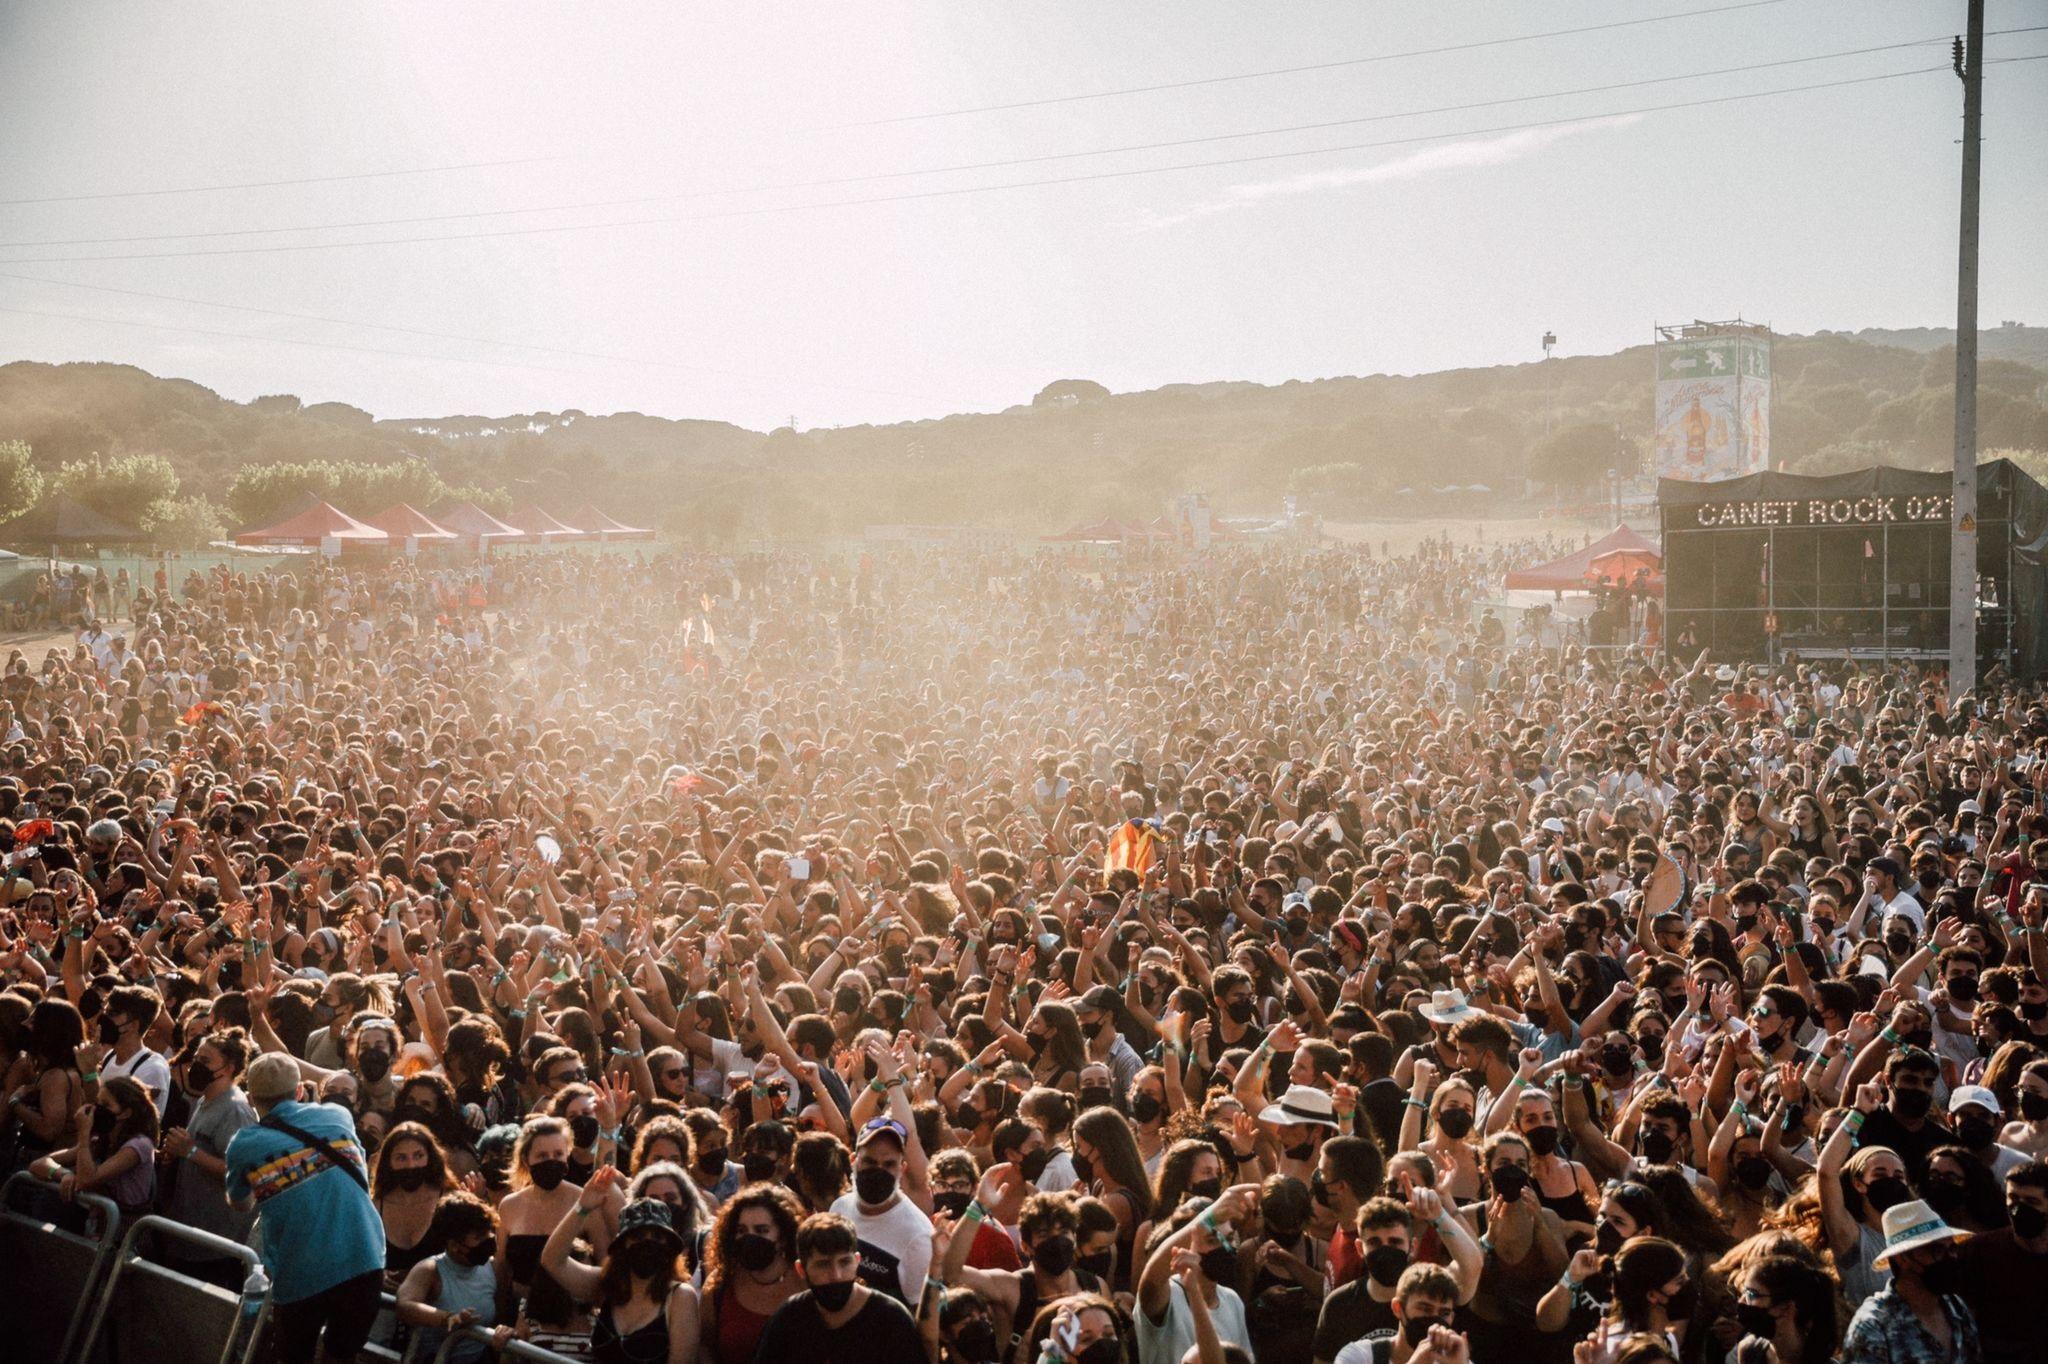 Festival Canet Rock 2021 / EUROPA PRESS